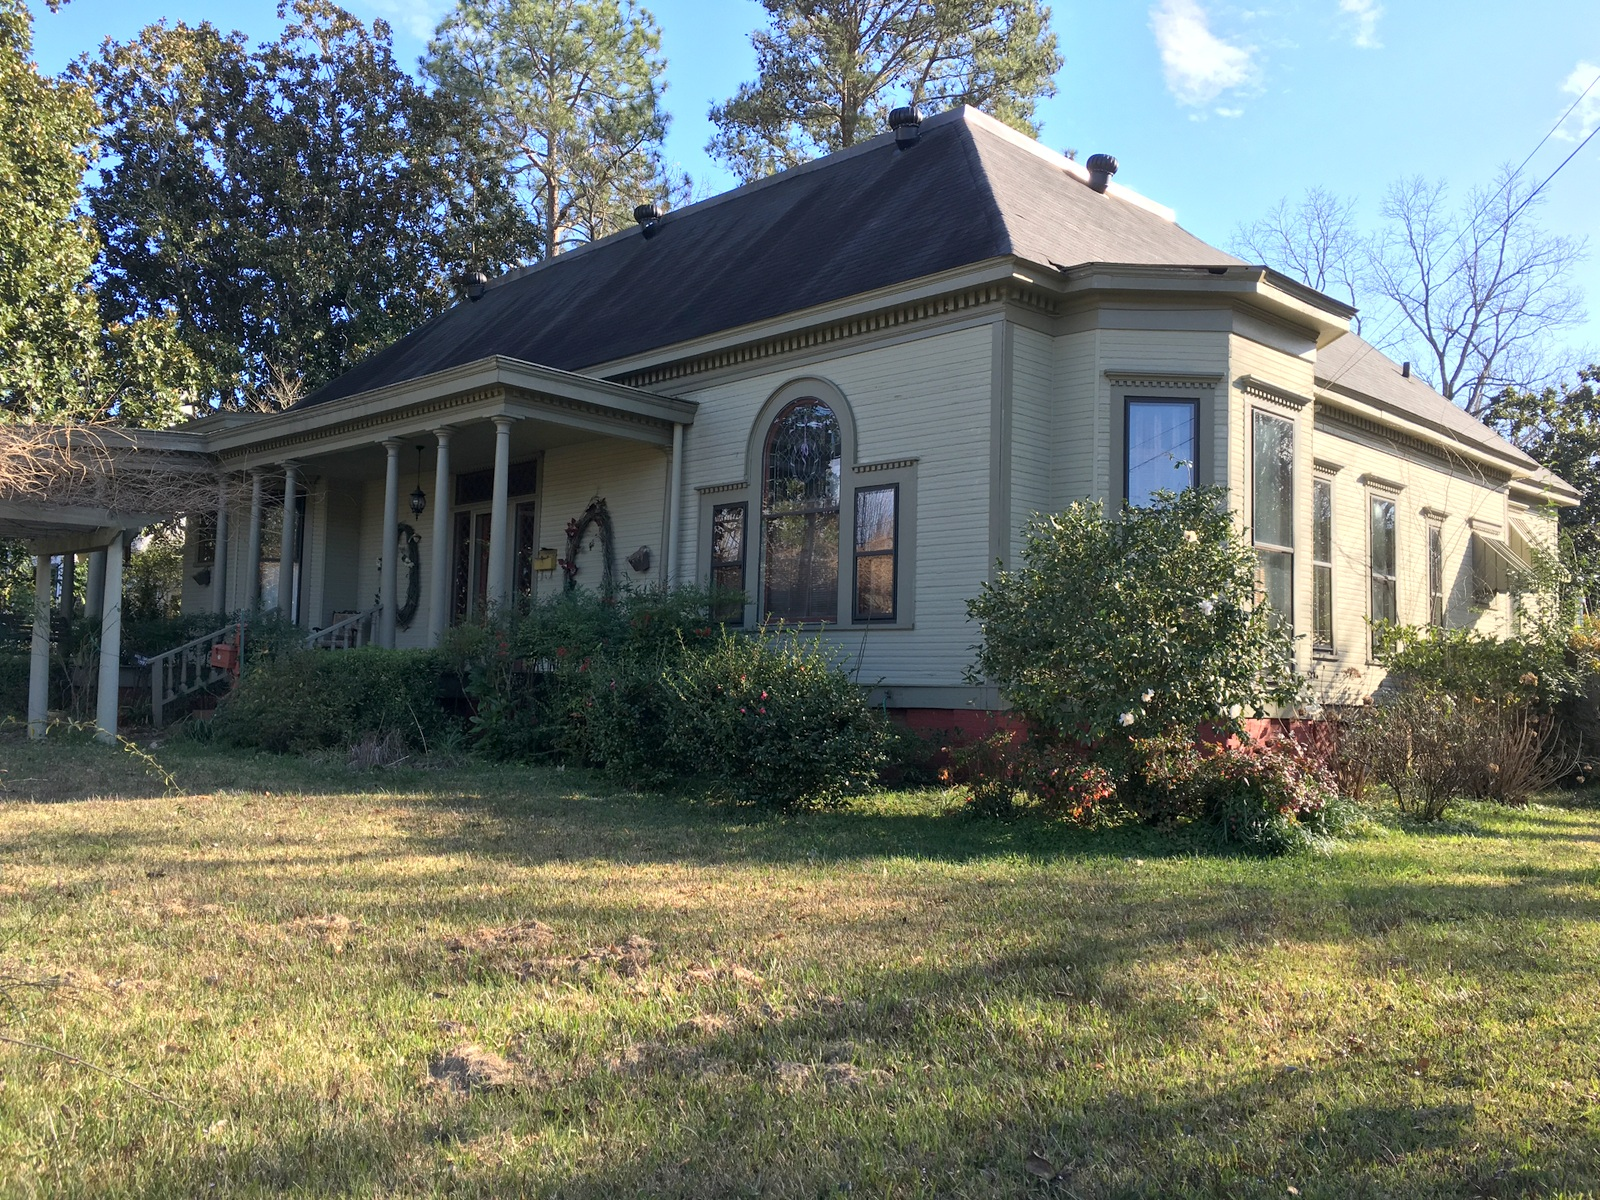 509 W. Commerce Street, Aberdeen, Mississippi 39730